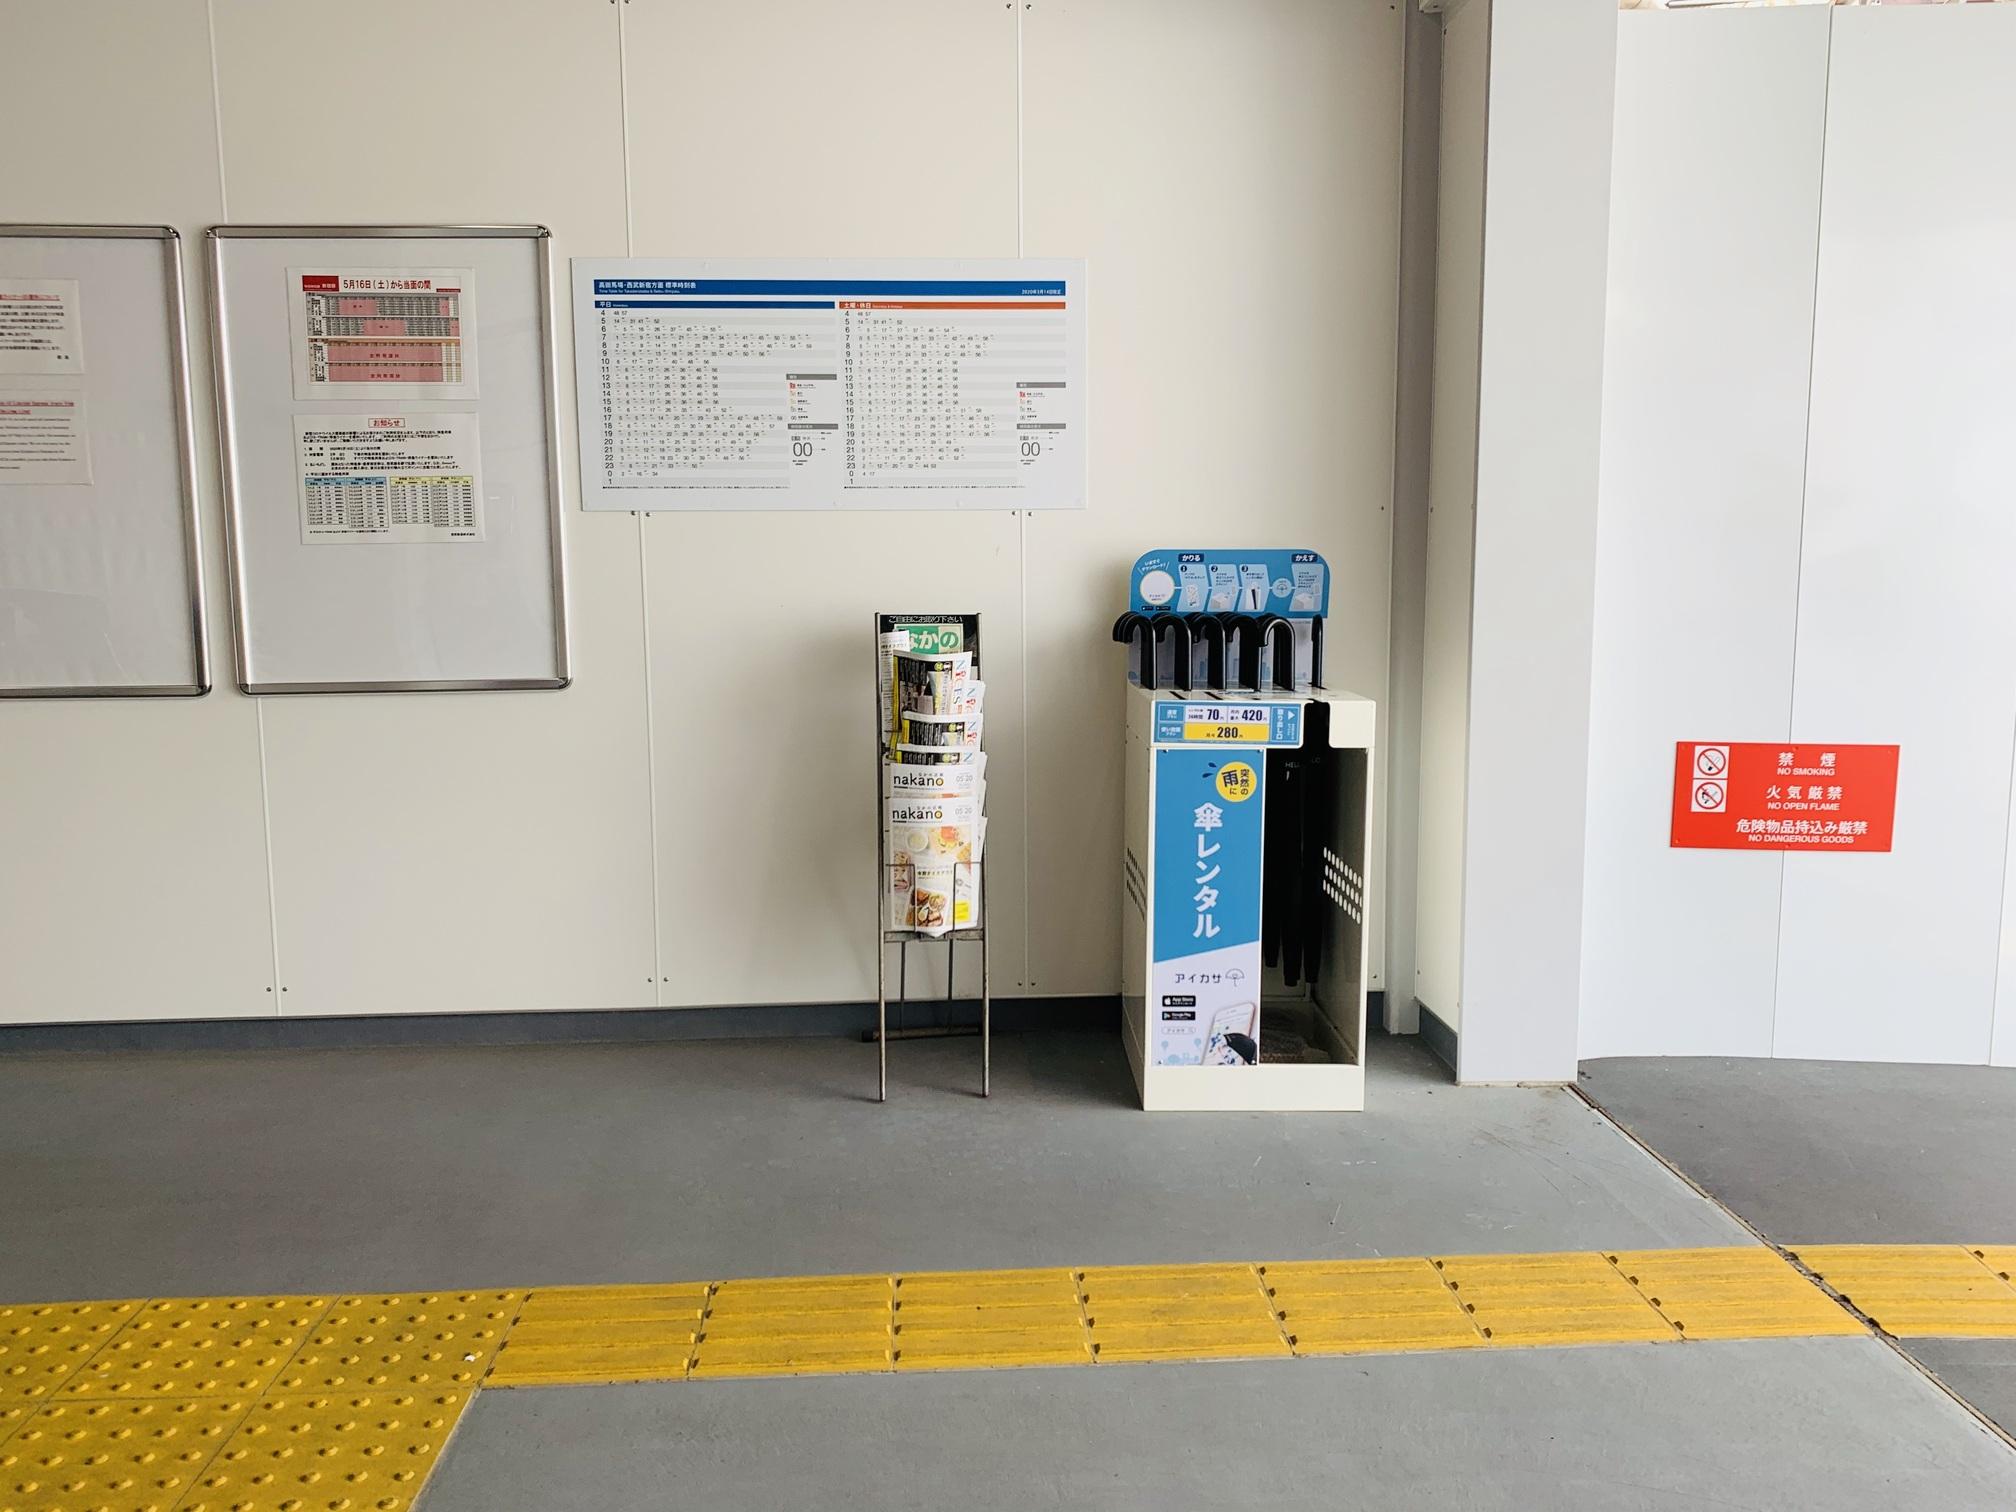 アイカサ 西武新宿線 新井薬師前駅北口